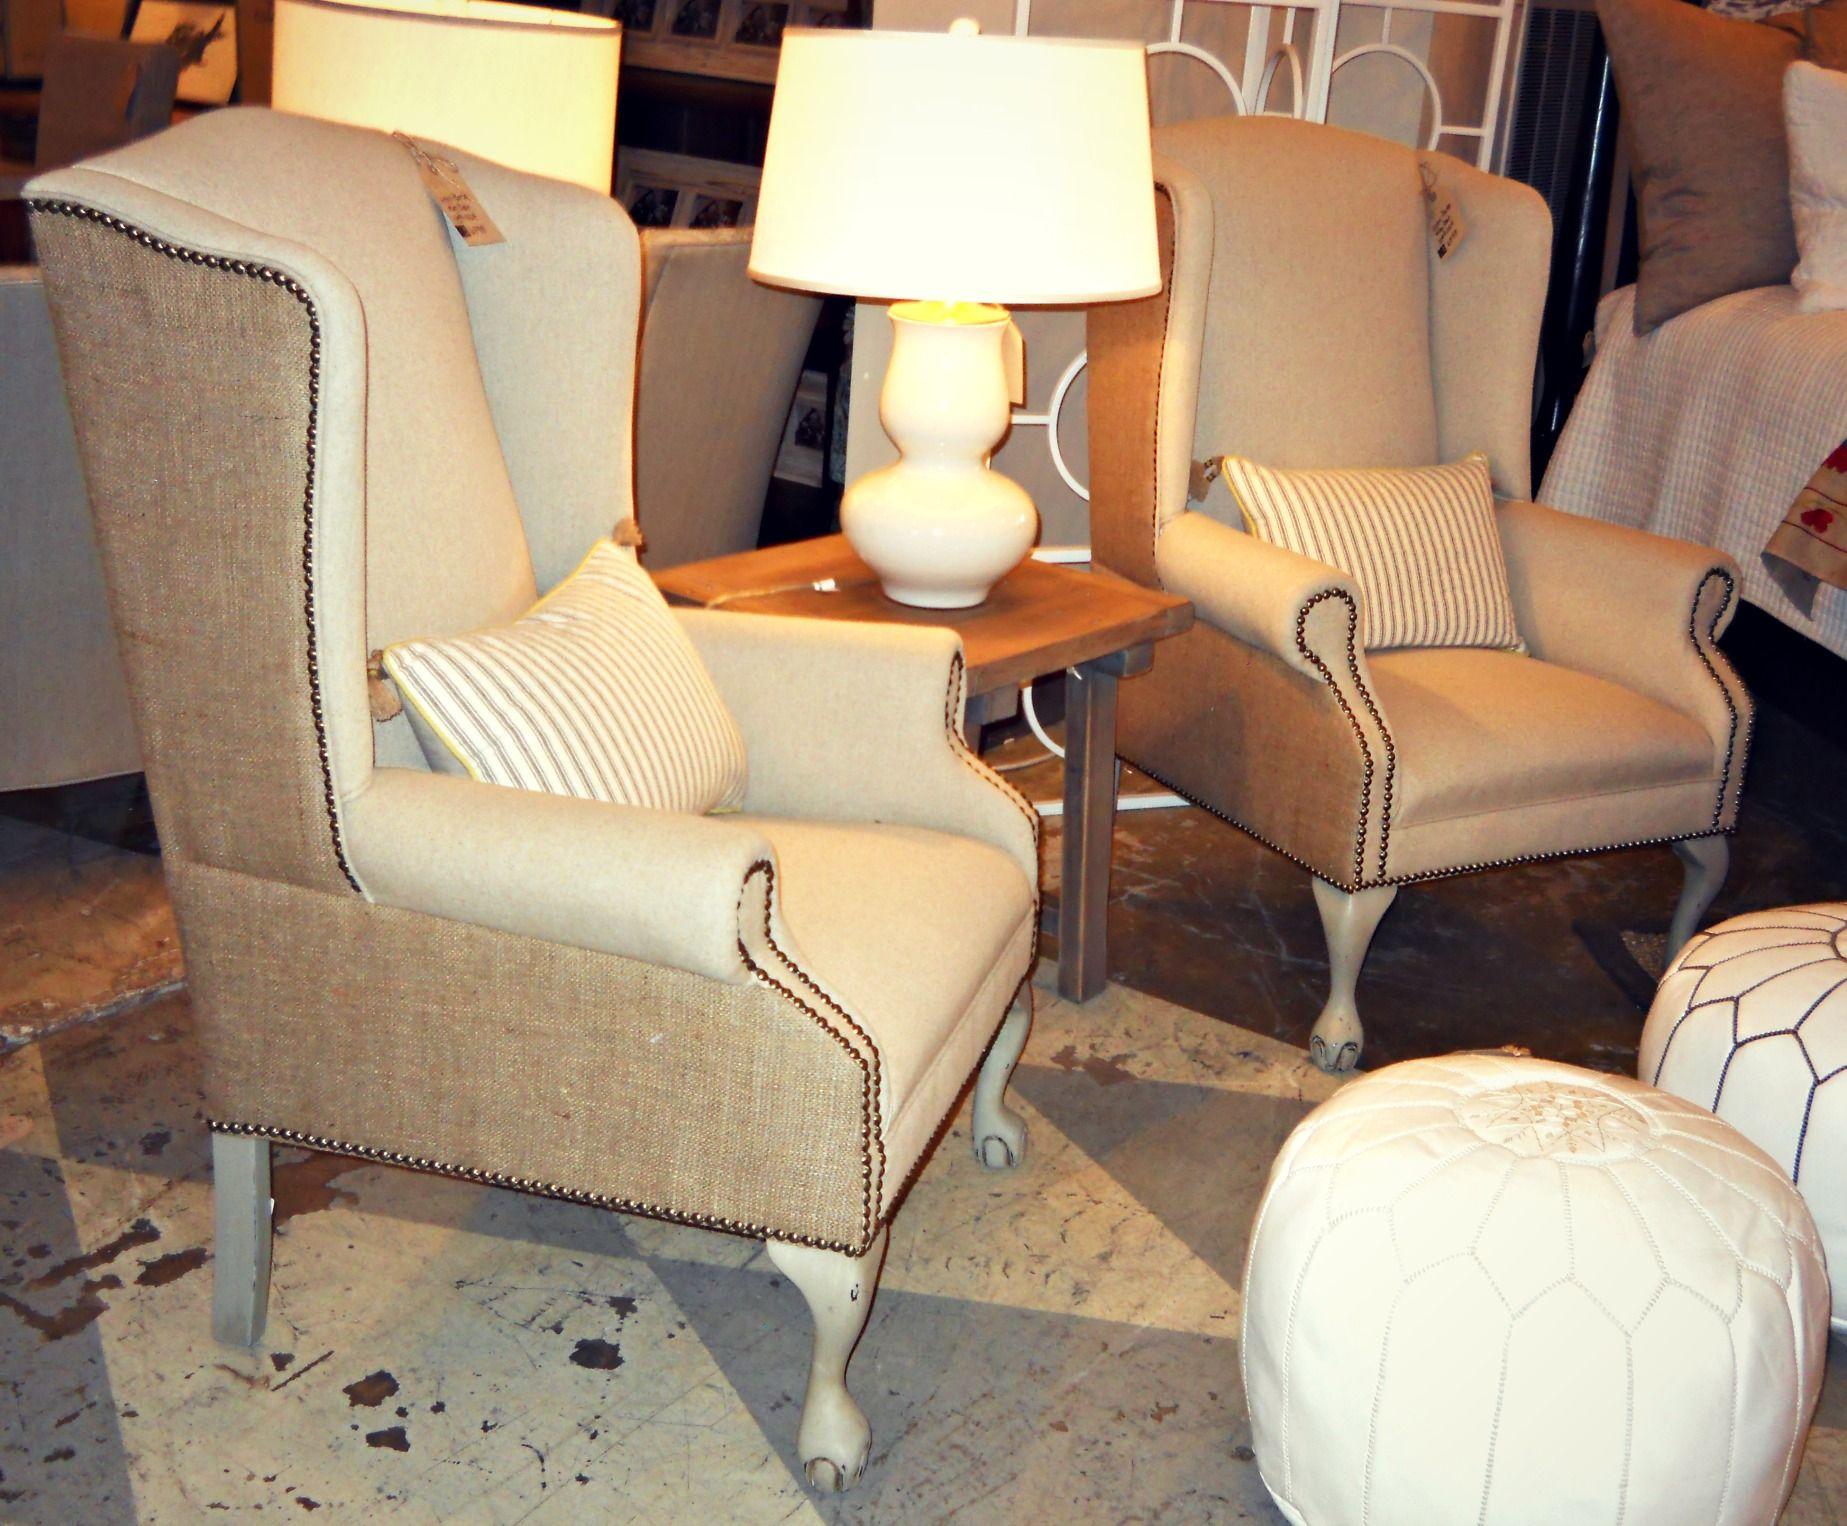 Celadon Home Furnishings Accessories Home Furnishing